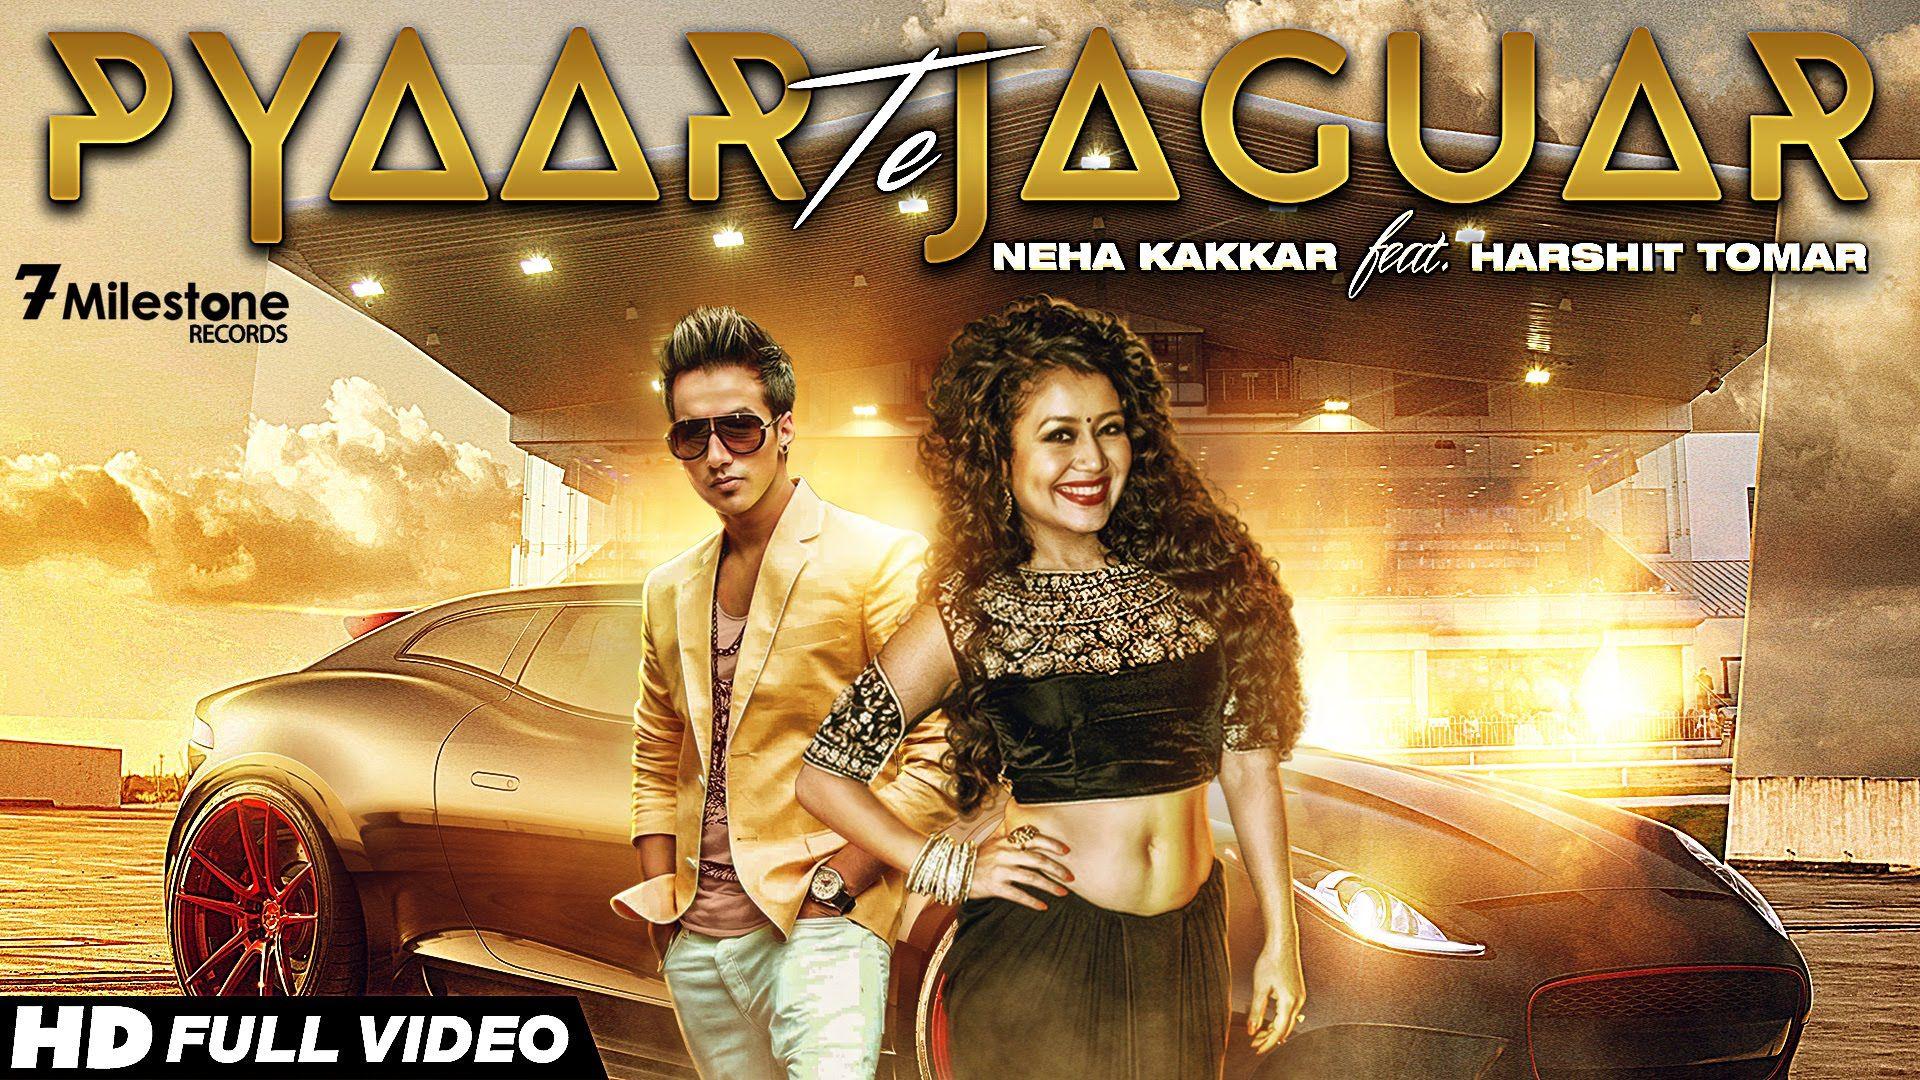 Pyaar Te Jaguar Neha Kakkar Ft. Harshit Tomar Latest